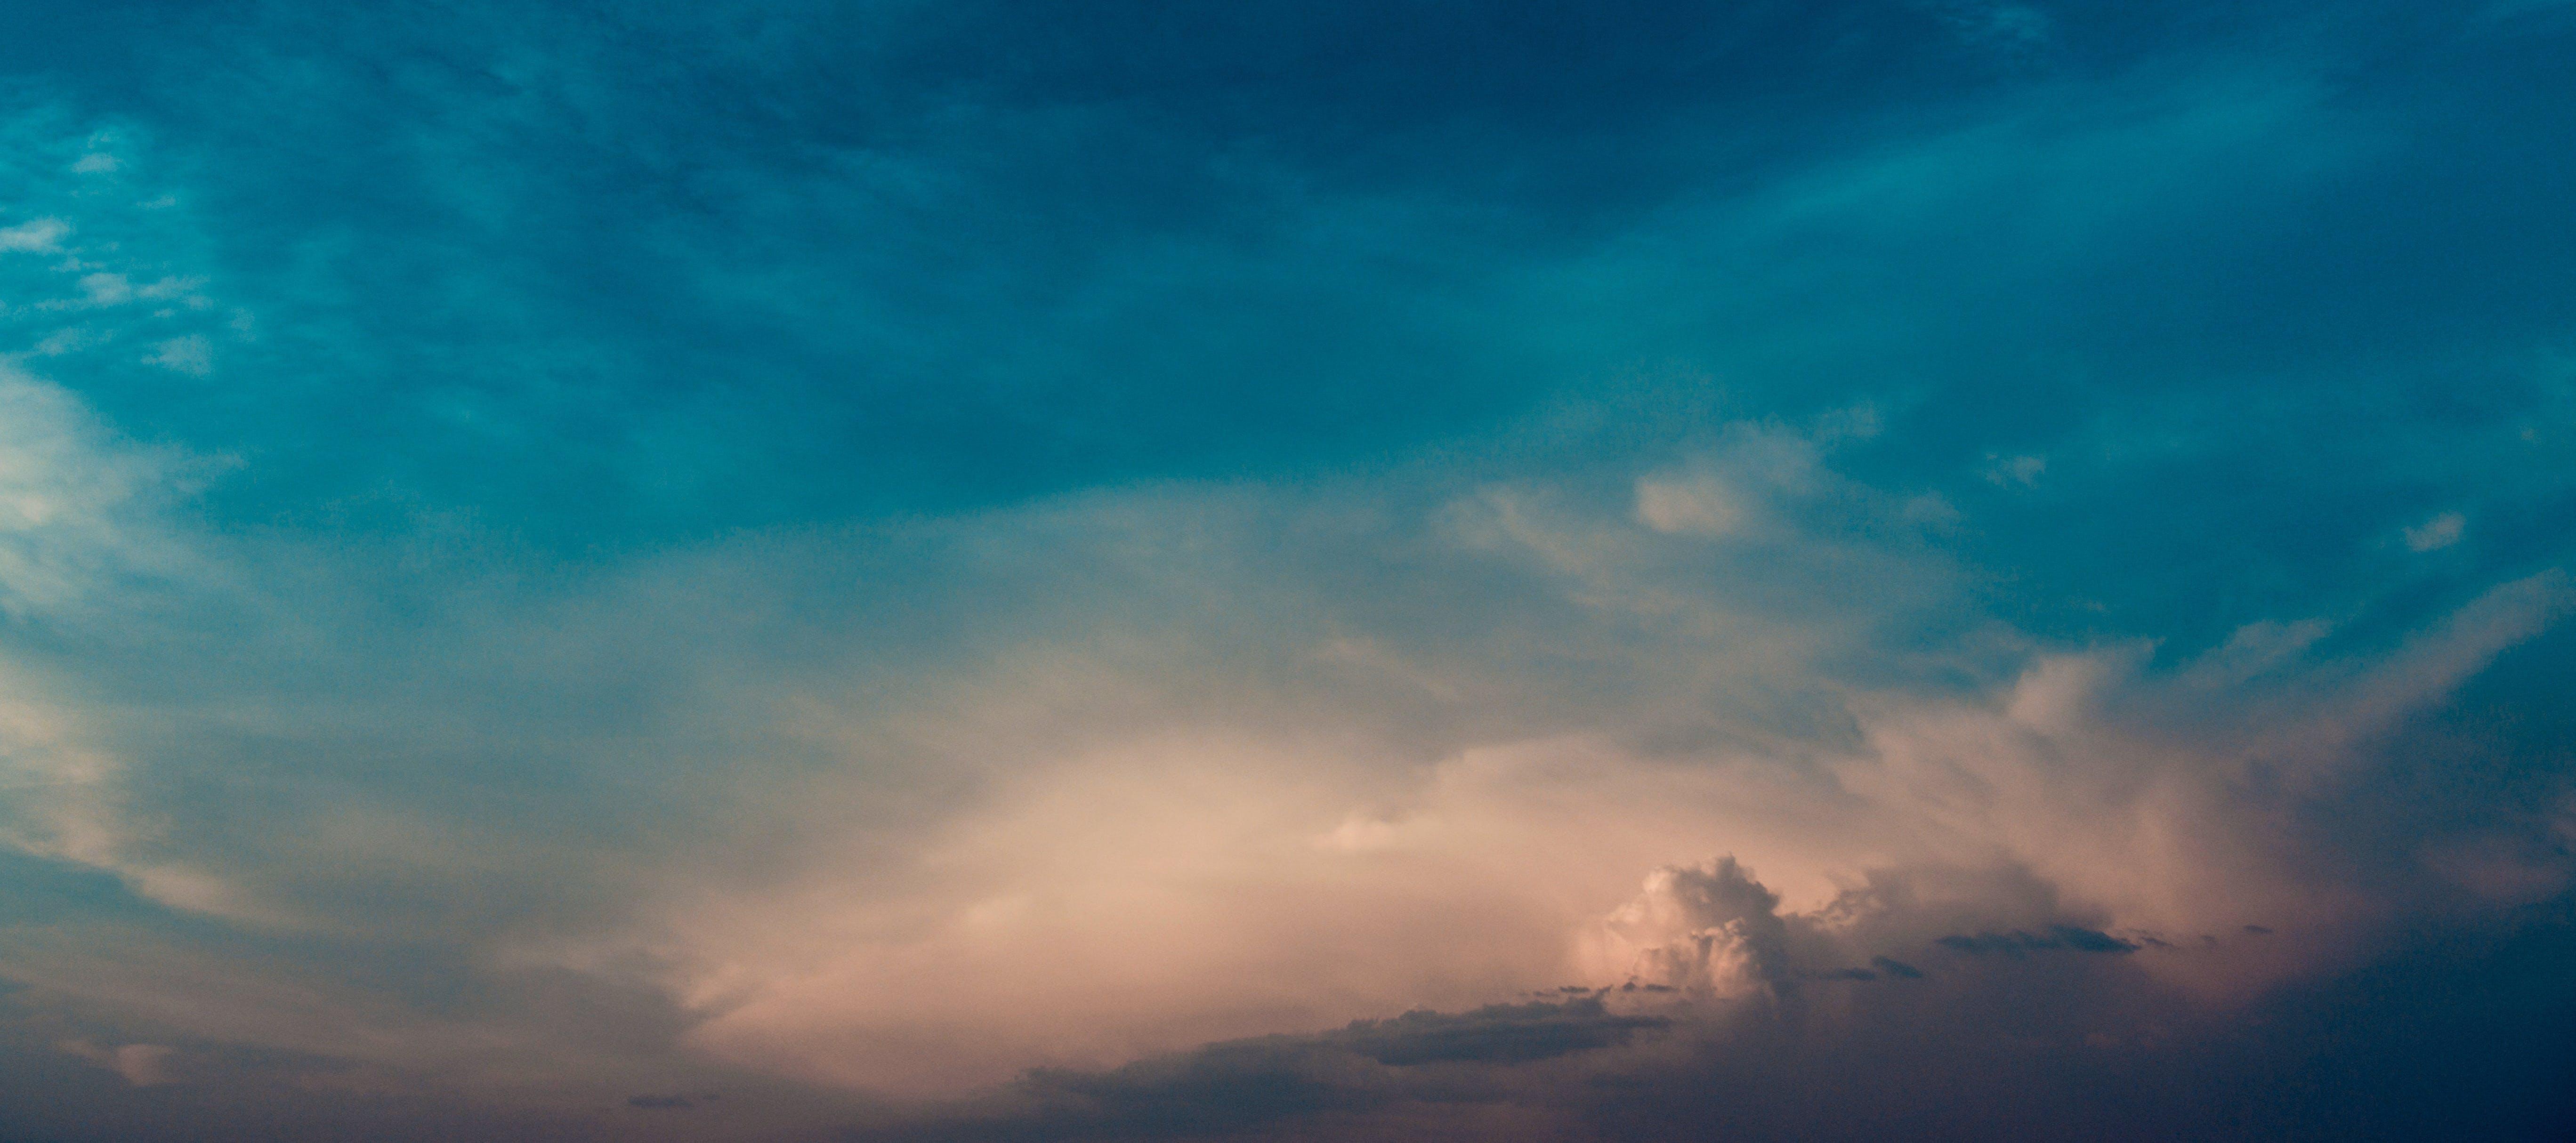 zu abend, bewölkt, blau, dämmerung